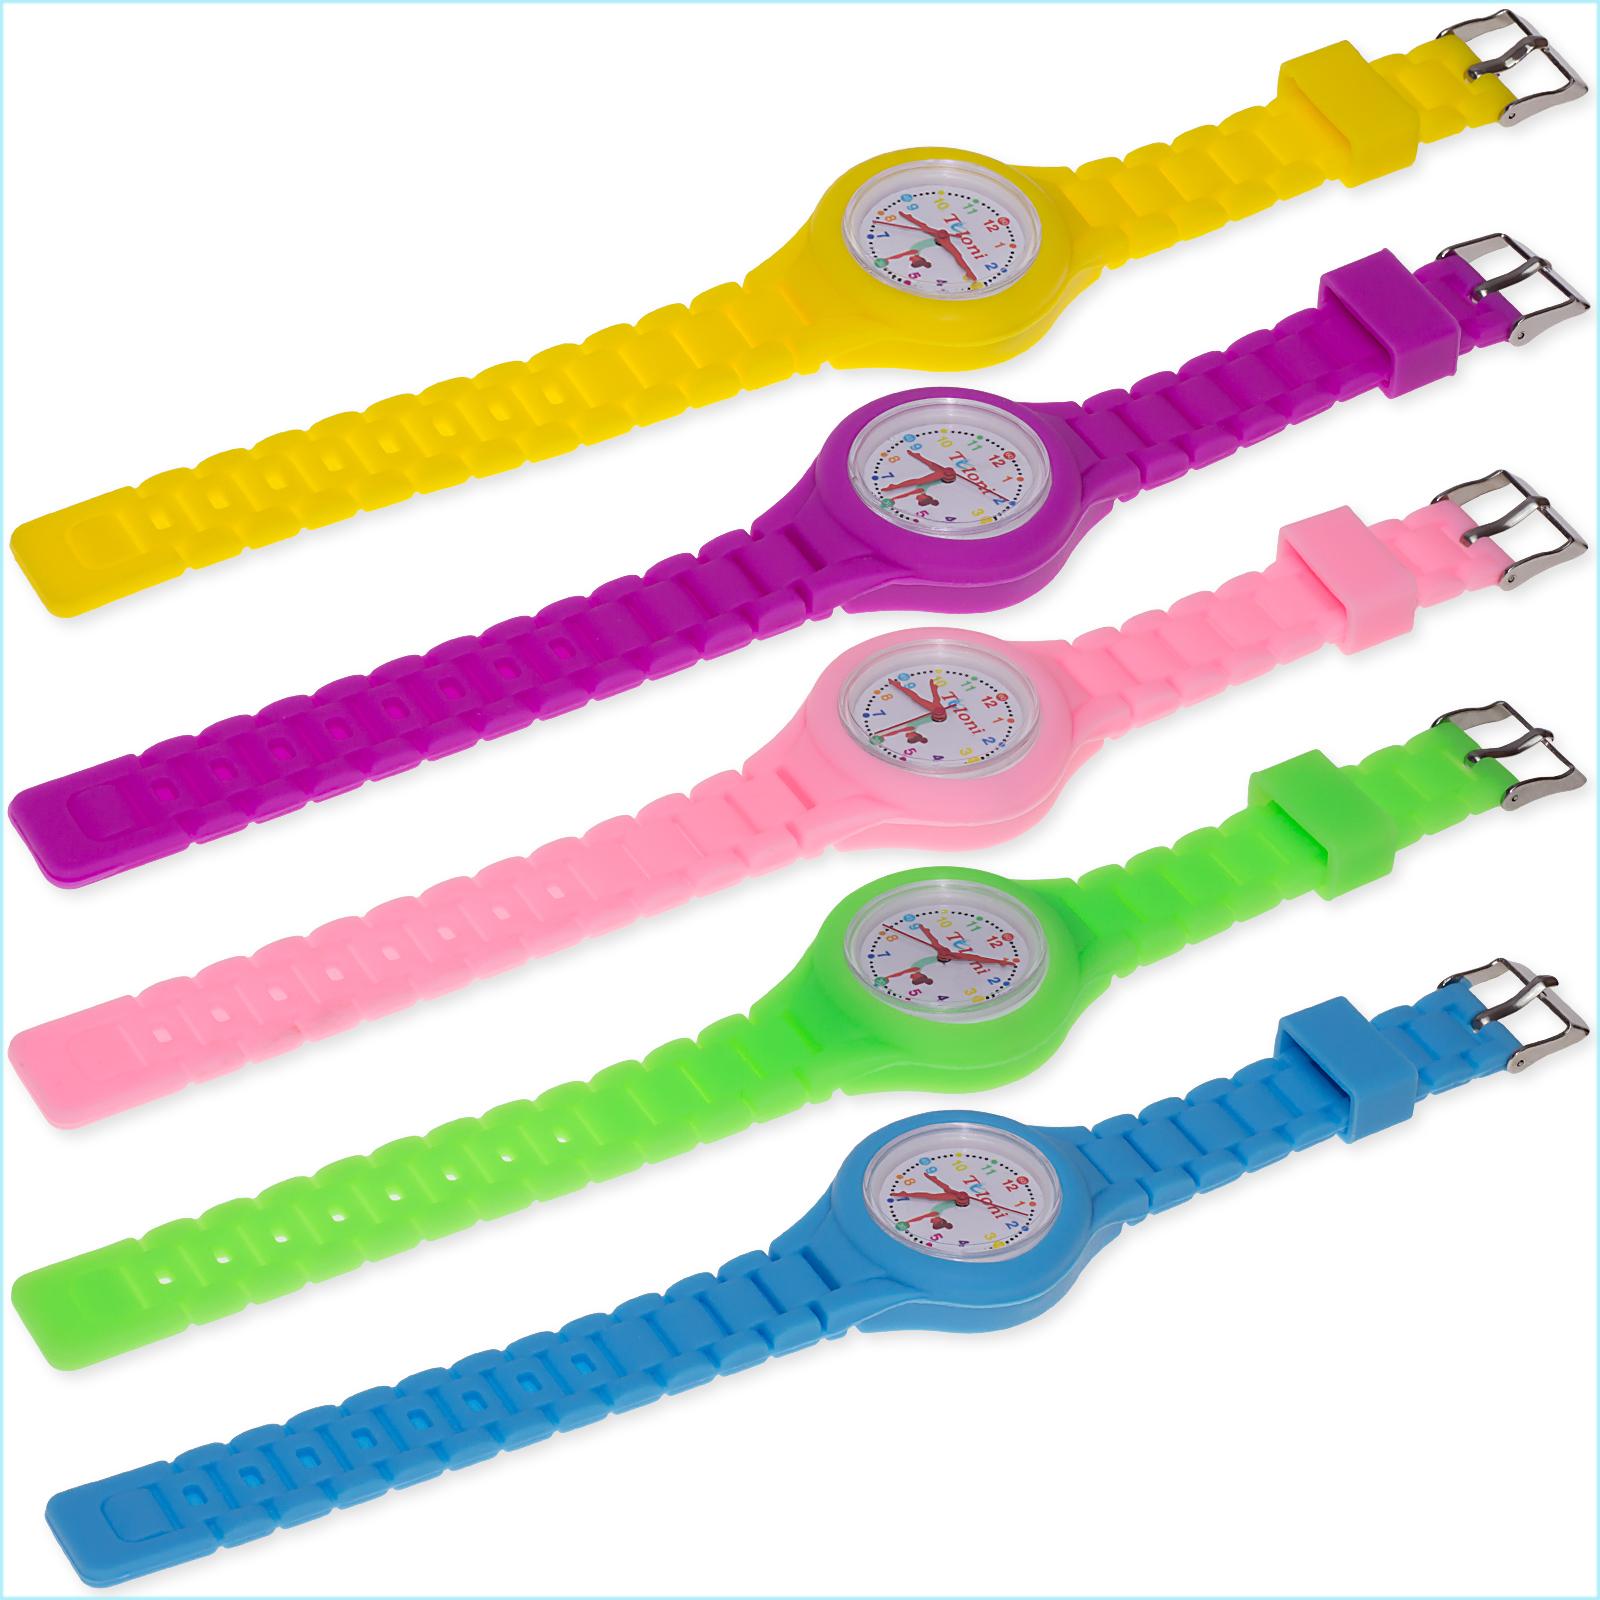 Часы Tuloni модель#1 ремешок#2 цвет Фуксия Артикул T0201-2Fu-1